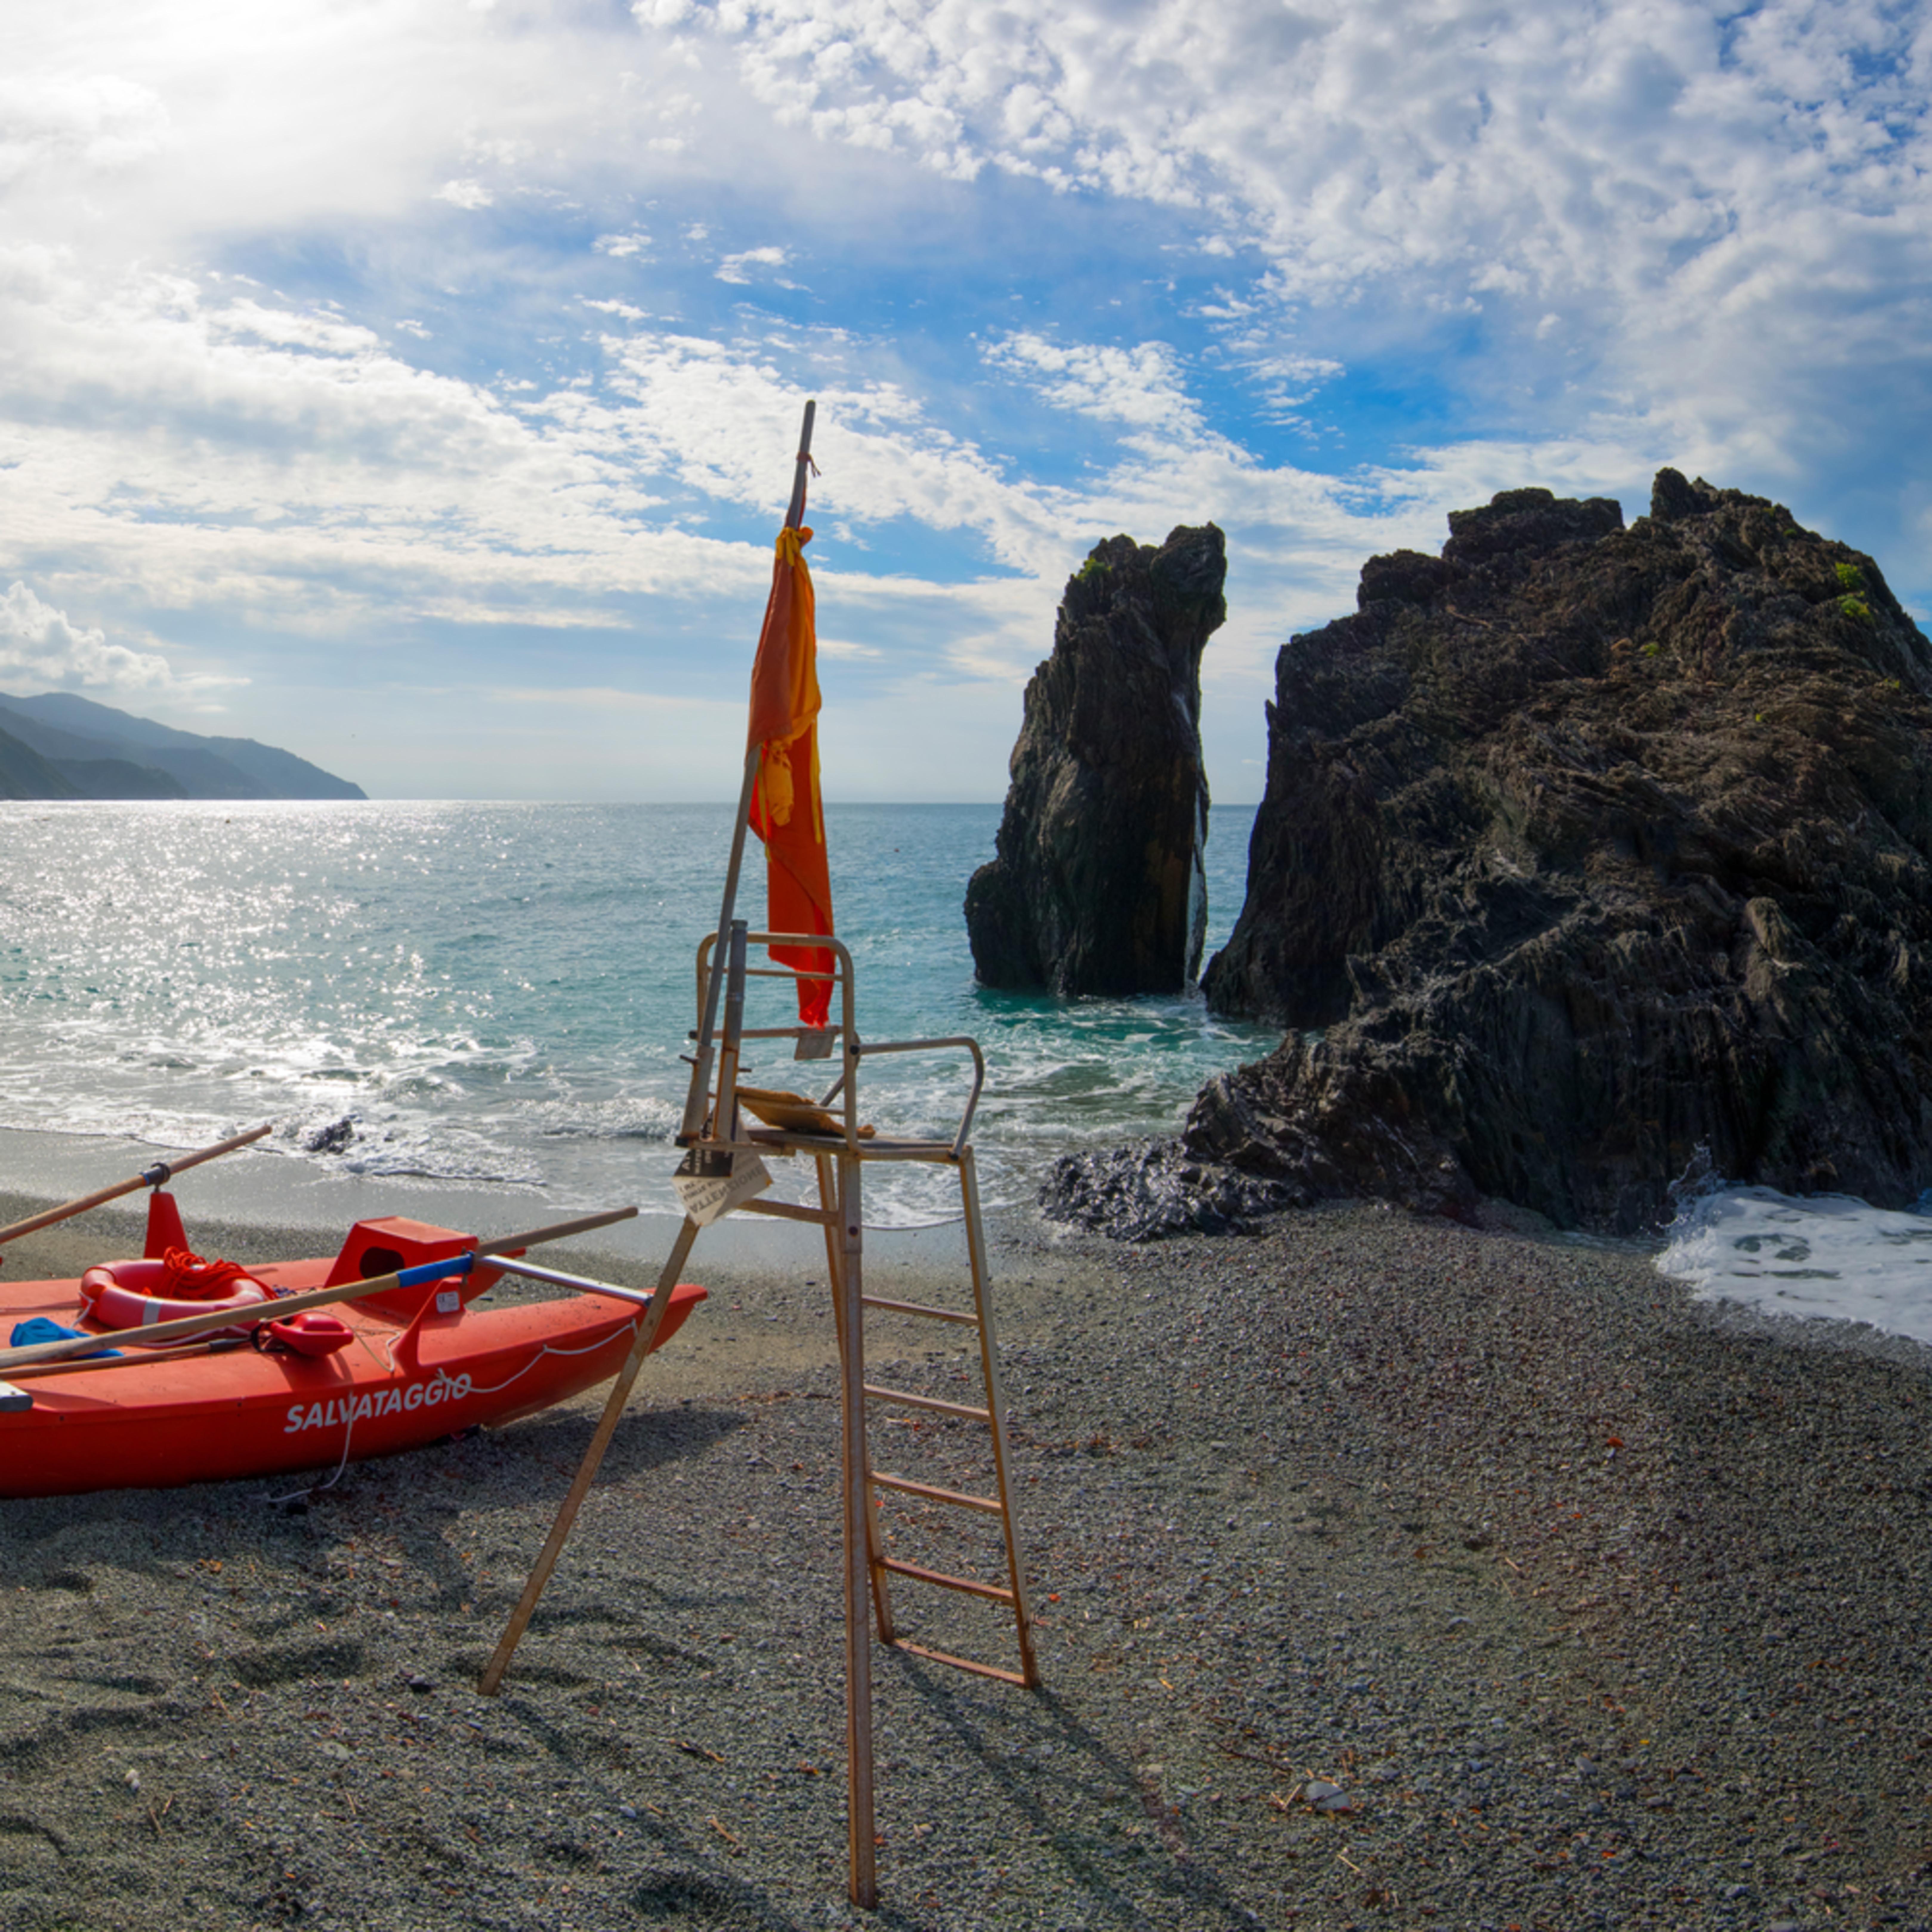 Monterroso lifeboat vizdji